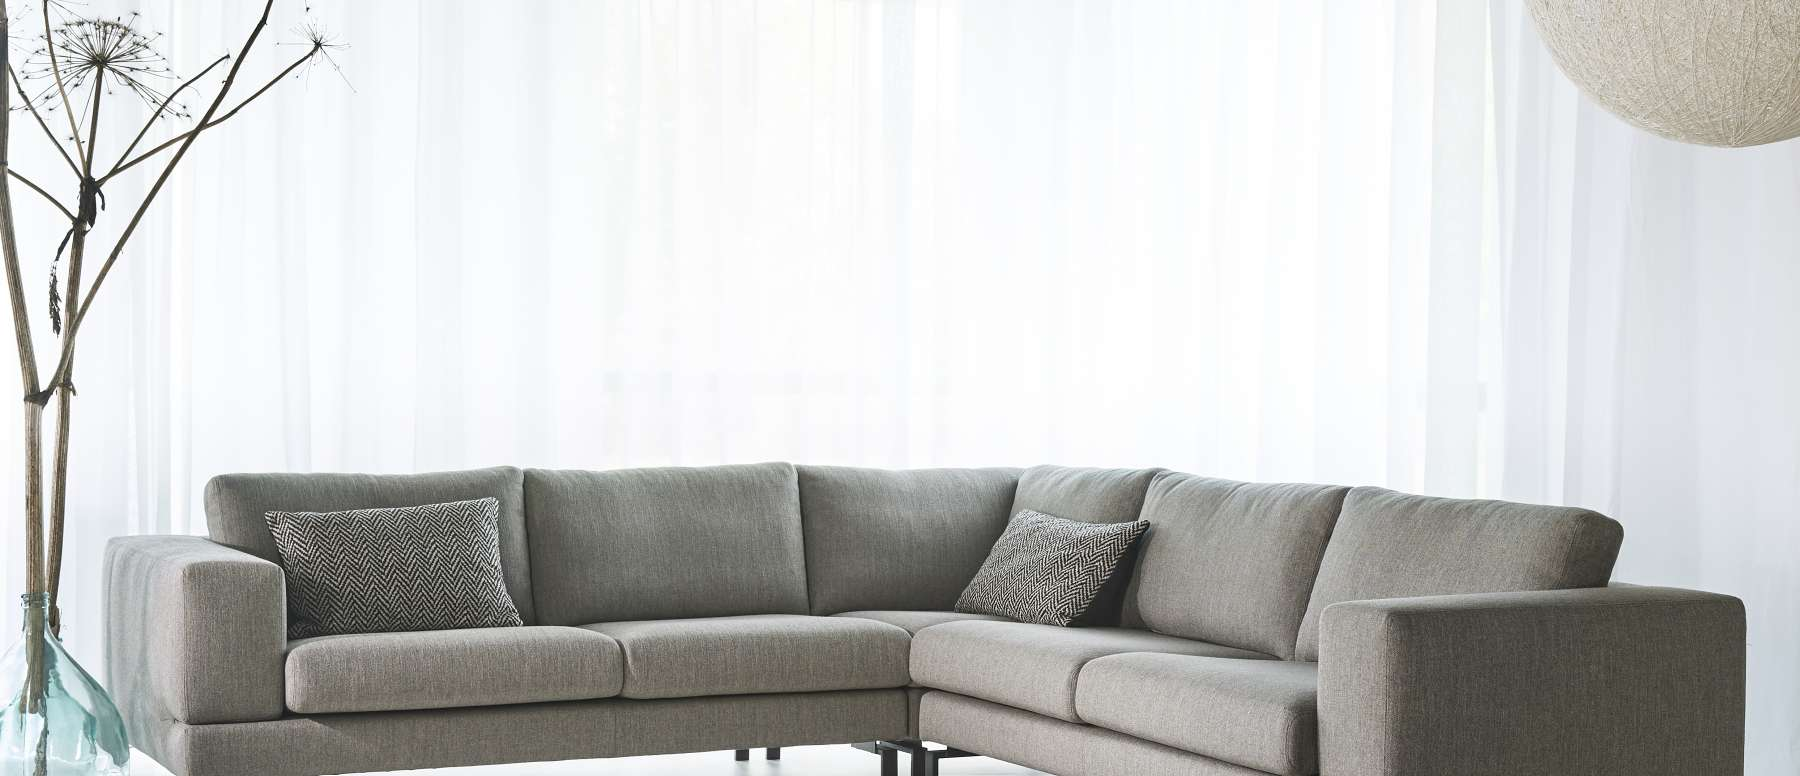 DN design meubelen 5